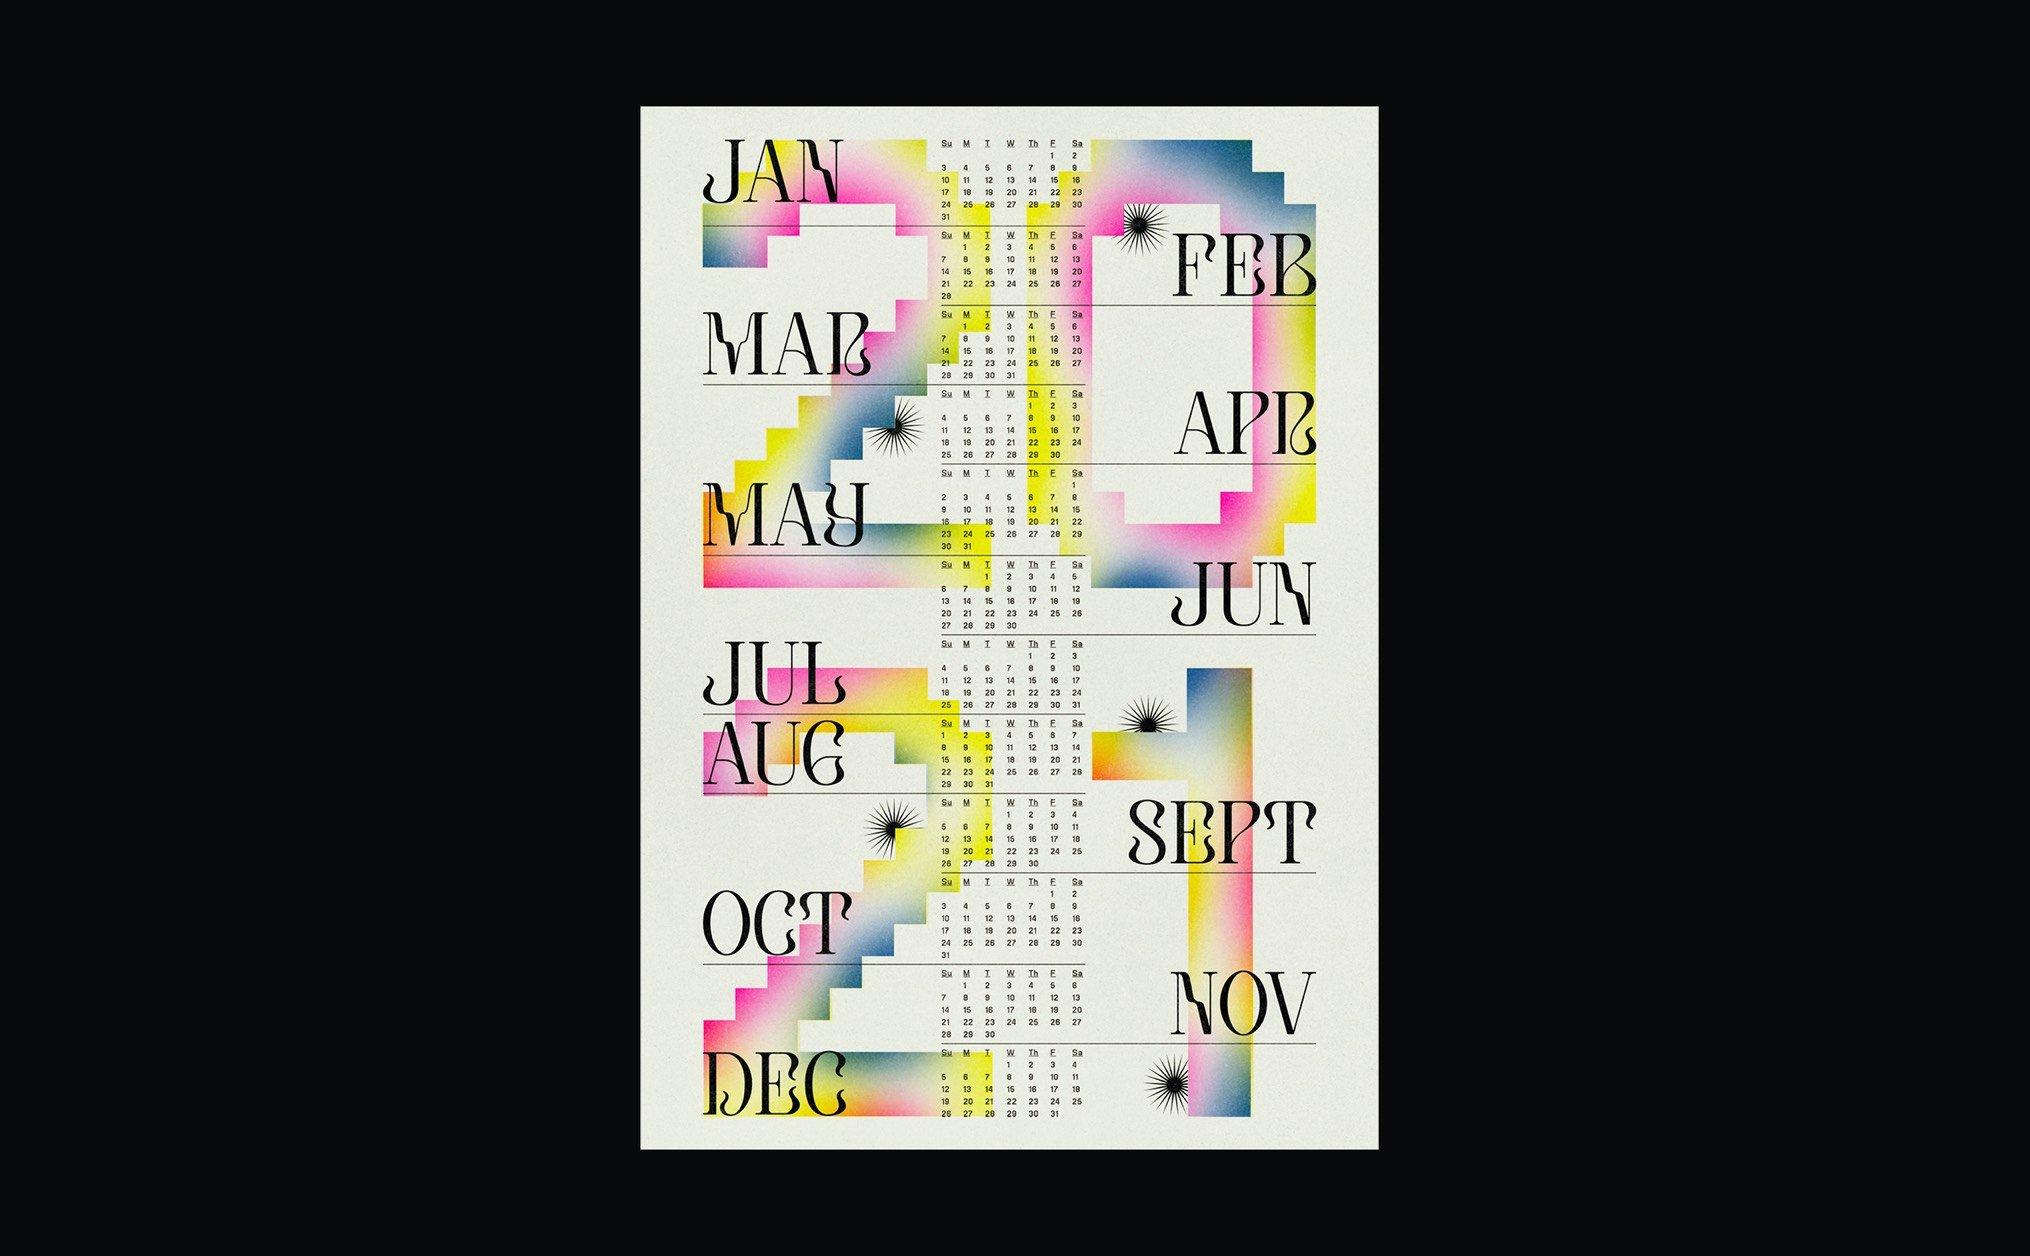 calendar-jo-malinis-img-05